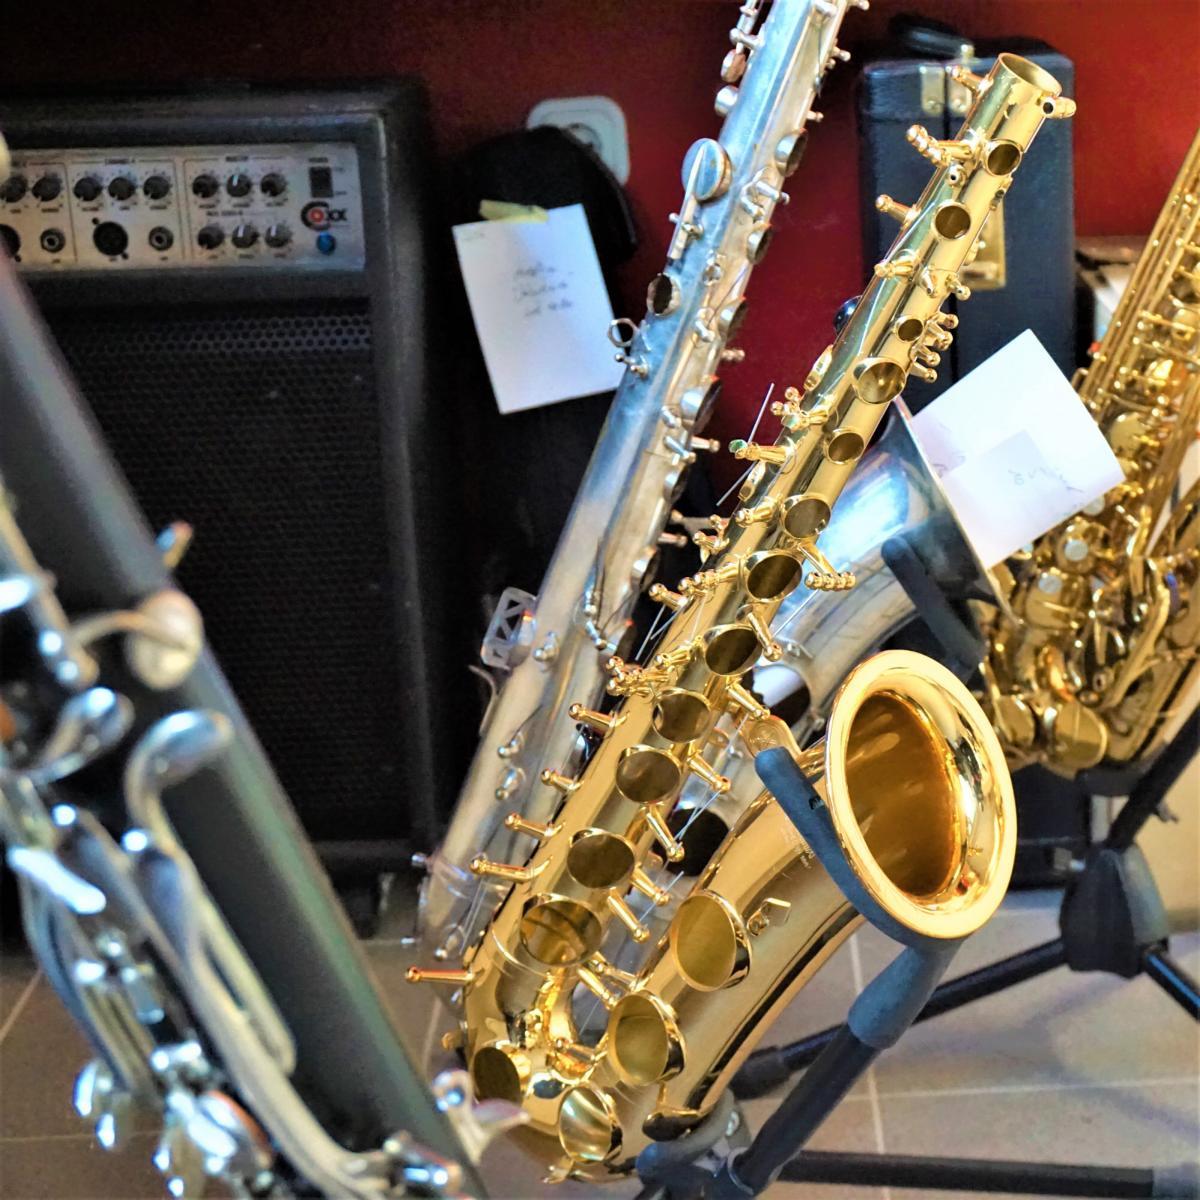 Style Hannover musimiet 2 - Musimiet: Probier' doch mal ein Instrument!